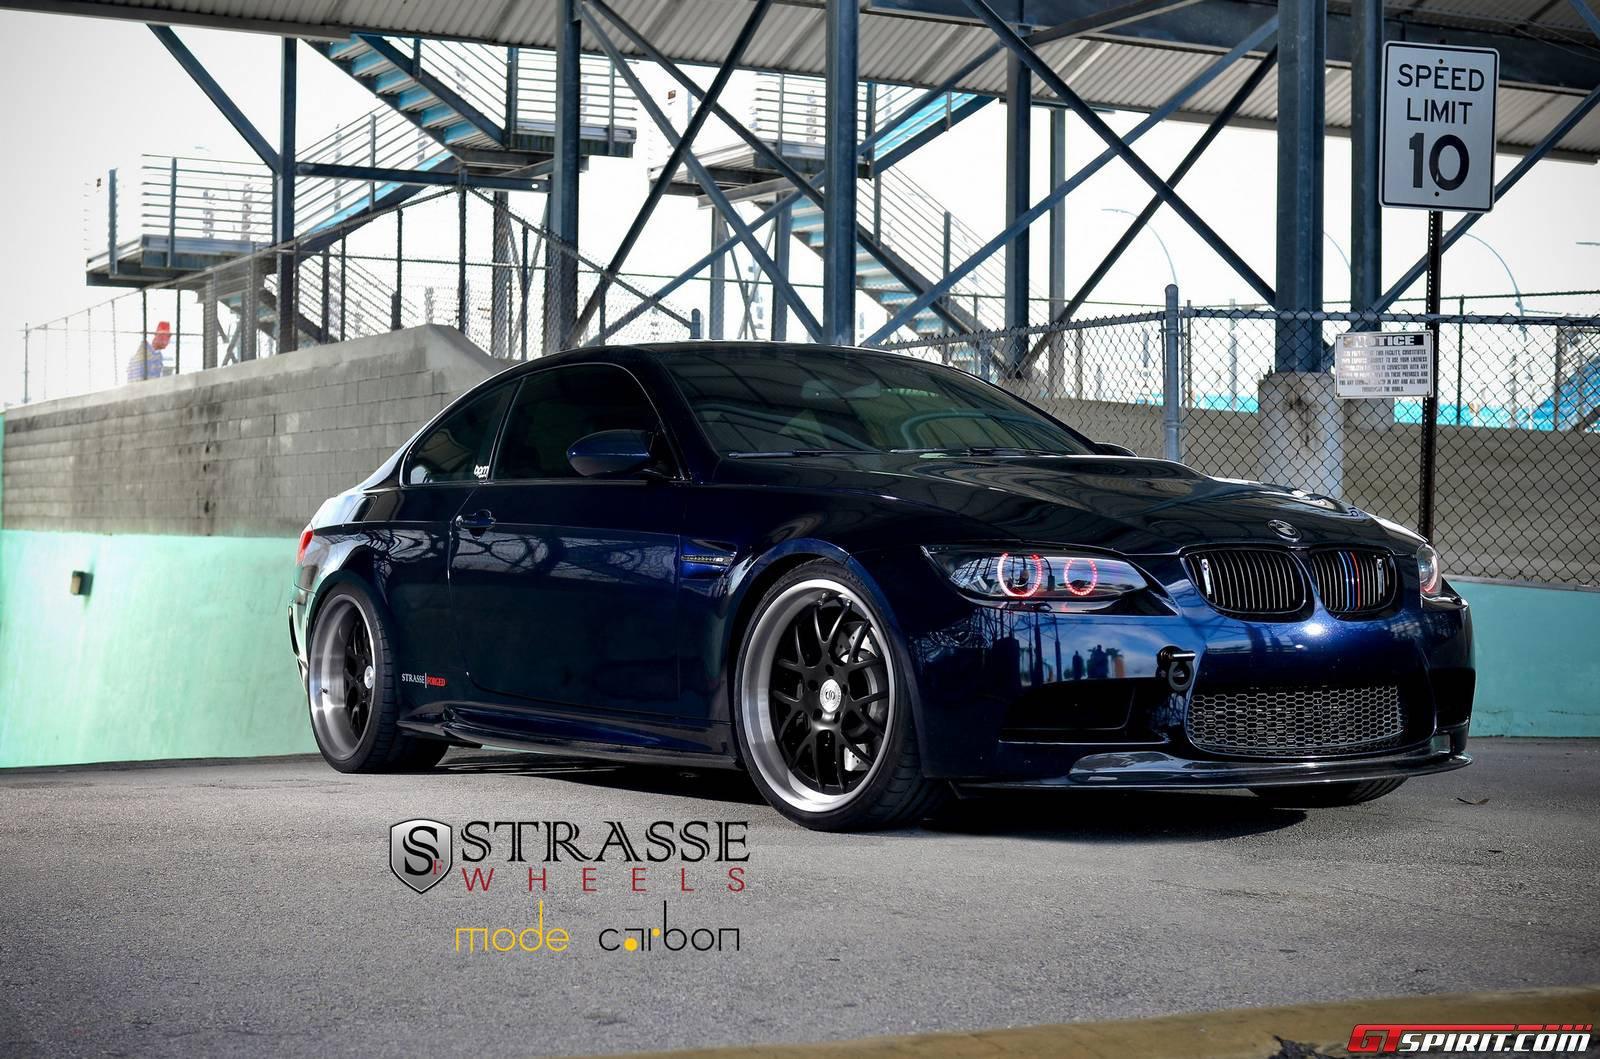 http://www.gtspirit.com/wp-content/gallery/strasse-wheels-bmw-m3/strasse-wheels-bmw-e92-m3-performance-series-sm7-step-lip-8.jpg